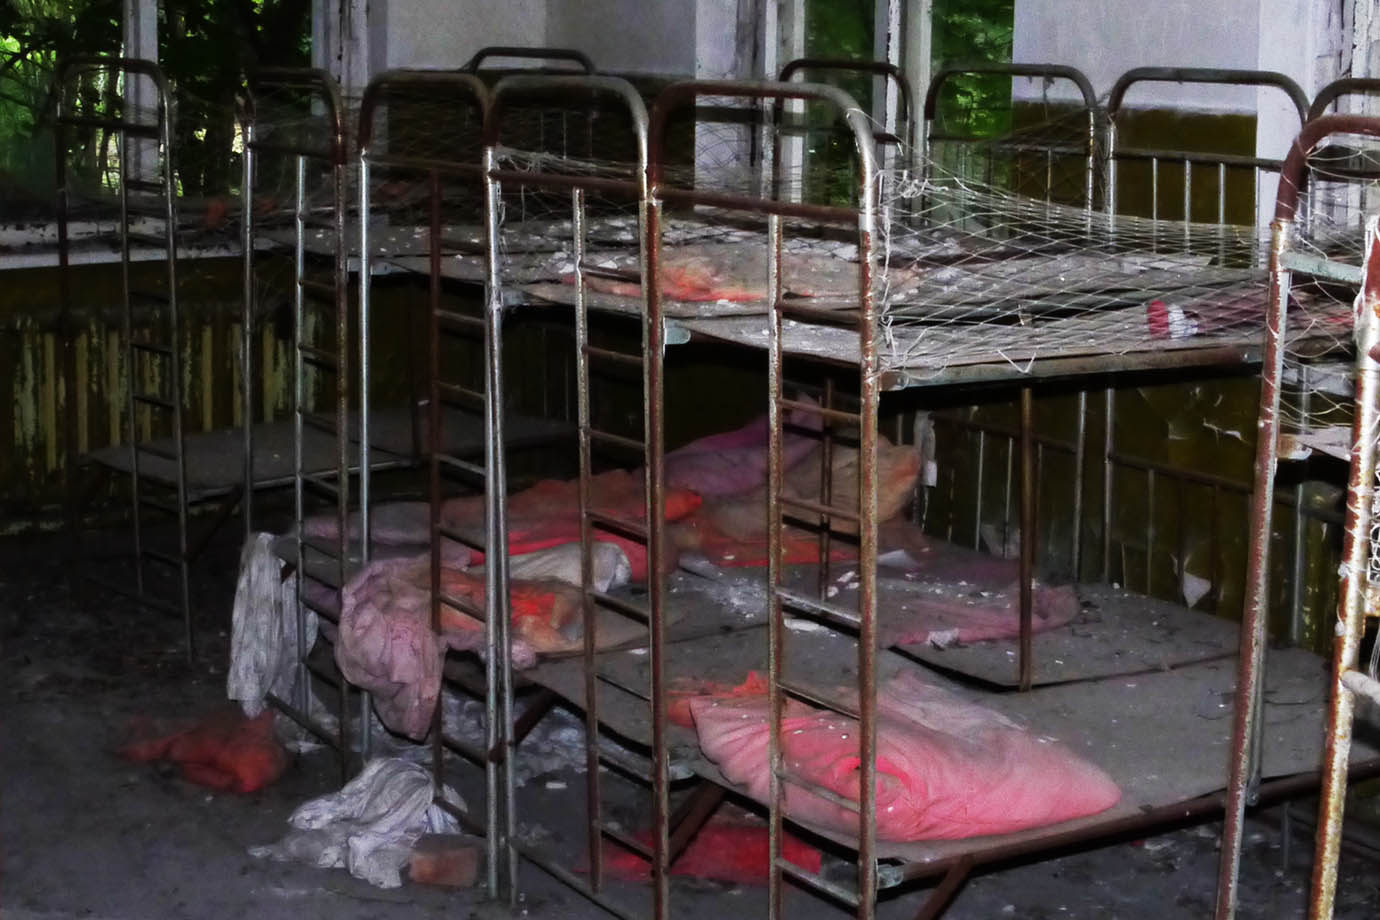 chernobyl-disaster15